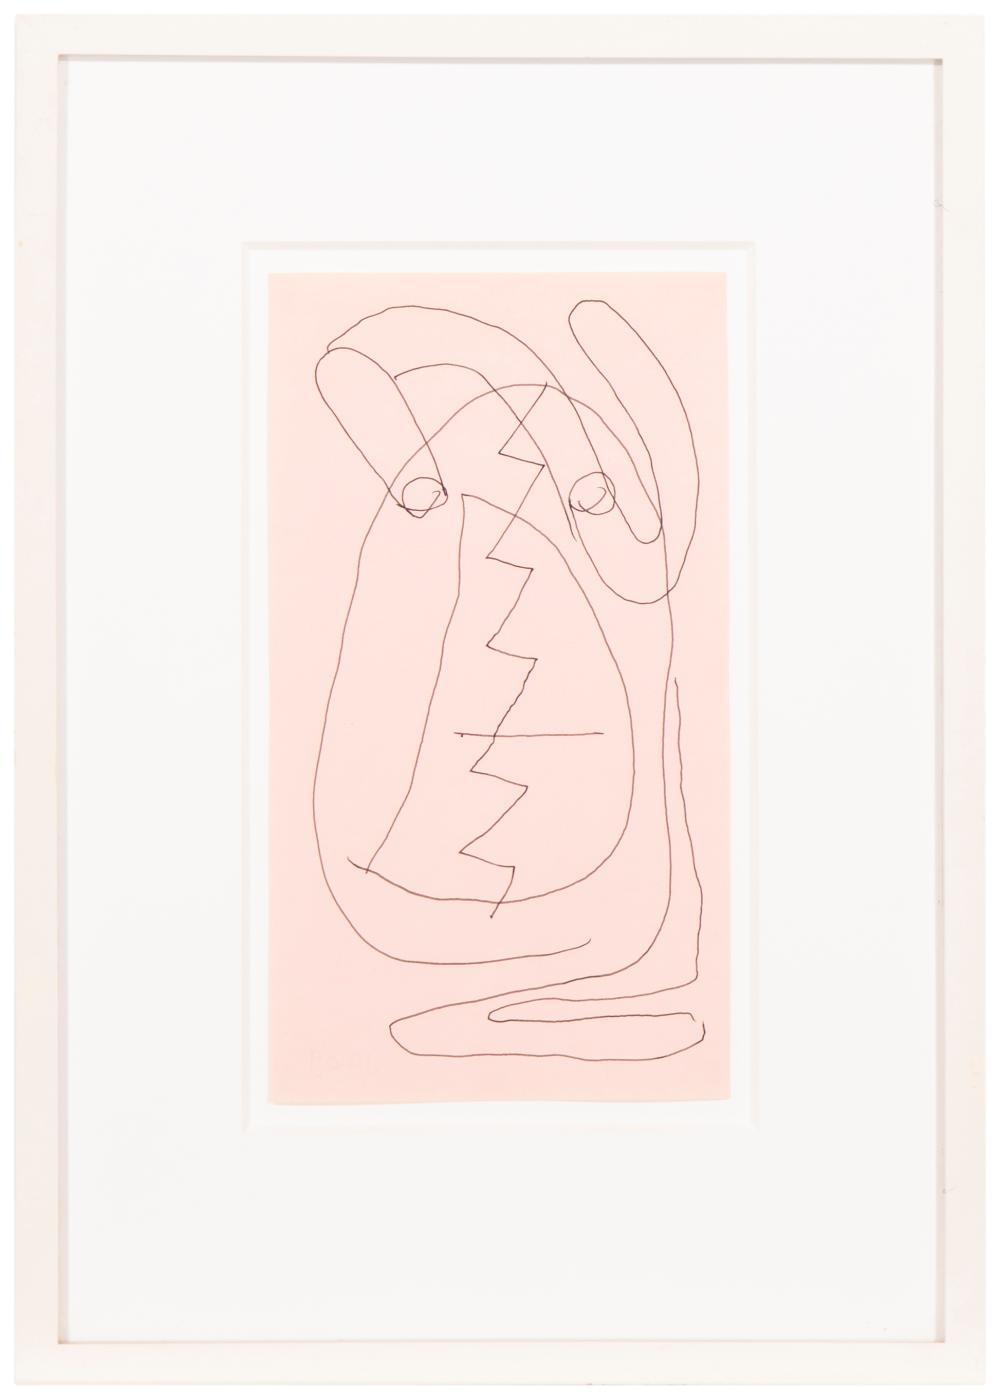 Joe Bradley, (b. 1975, American), Untitled, 2009, Ink on colored paper under Plexiglas, 8.75